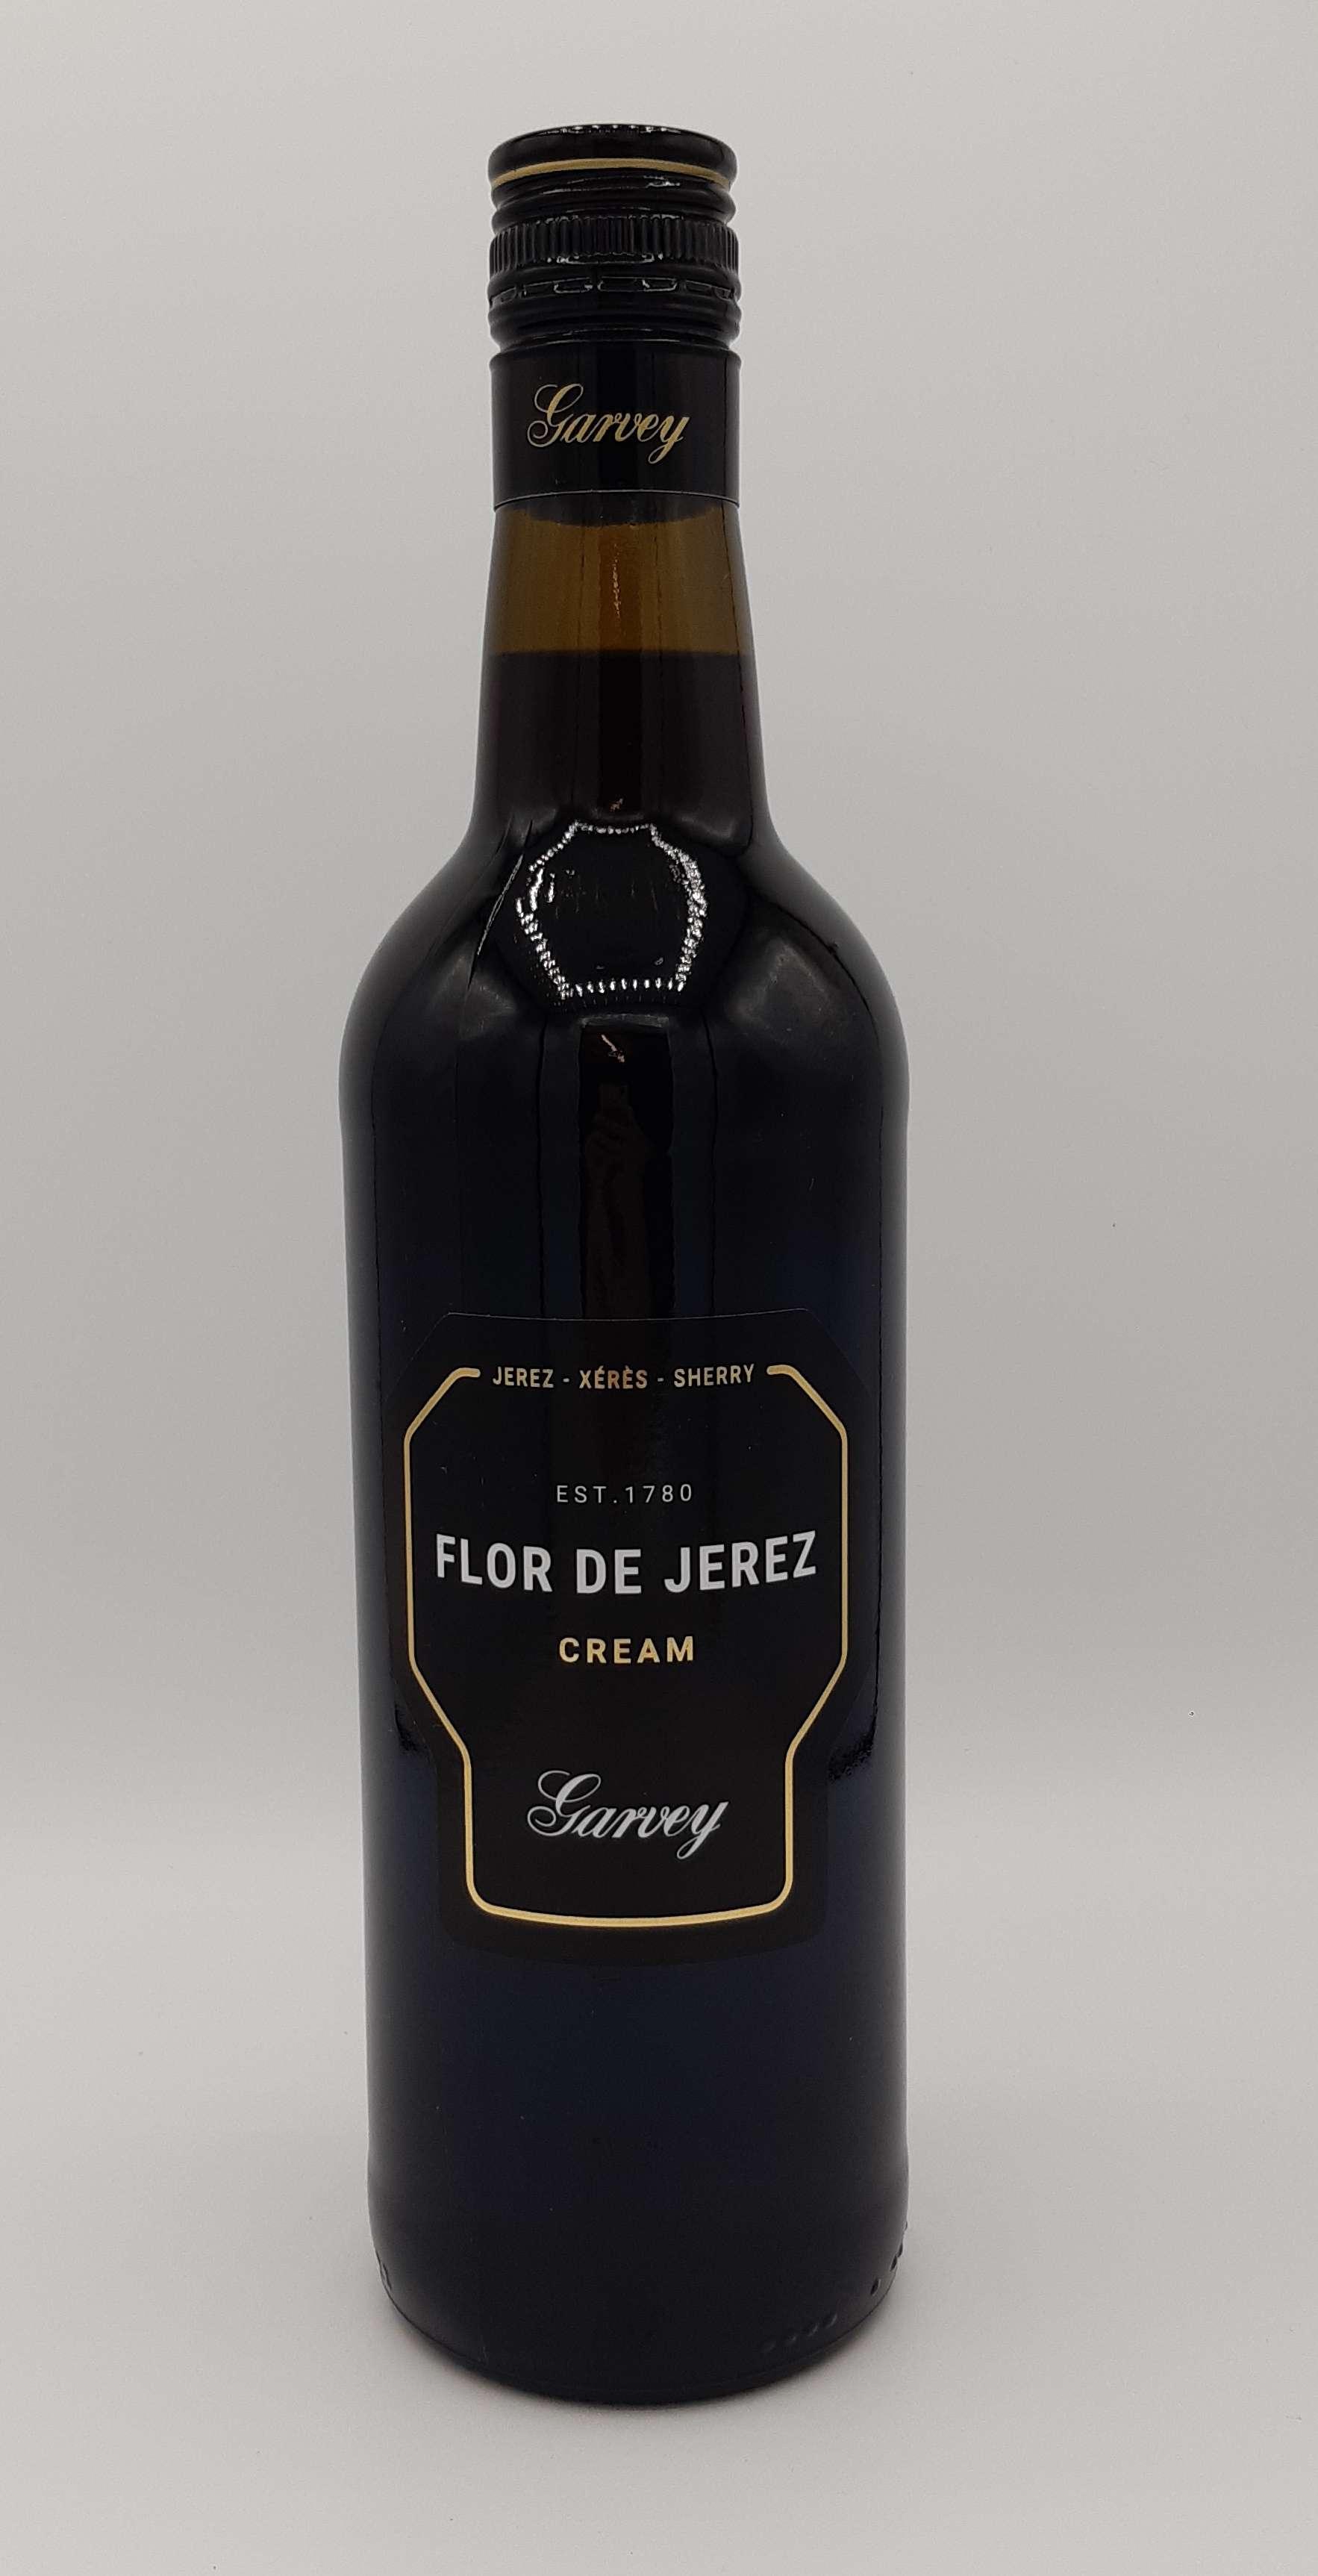 Garvey Flor de Jerez Cream Sherry